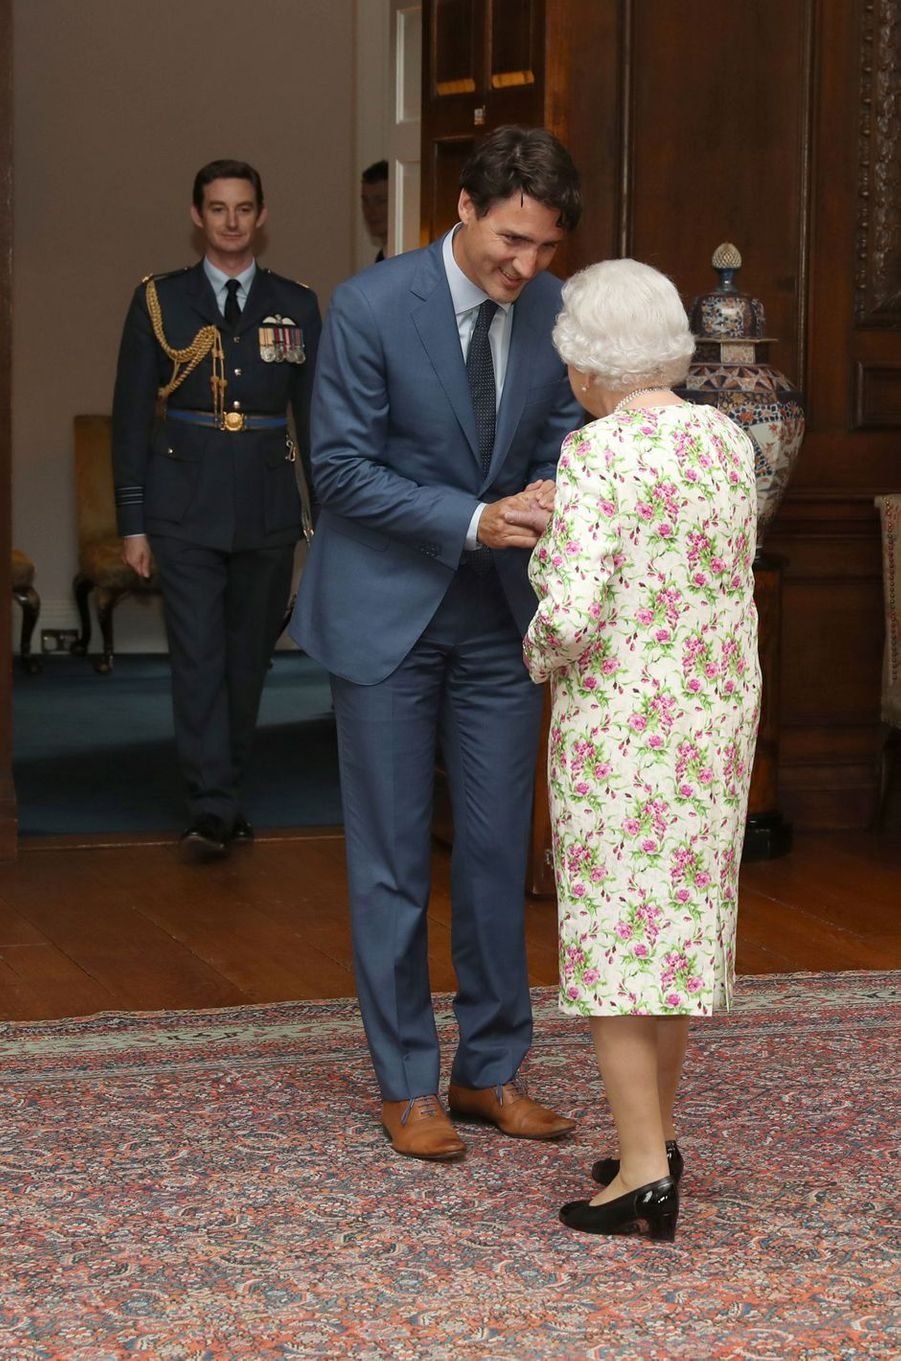 La reine Elizabeth II et Justin Trudeau à Edimbourg, le 5 juillet 2017